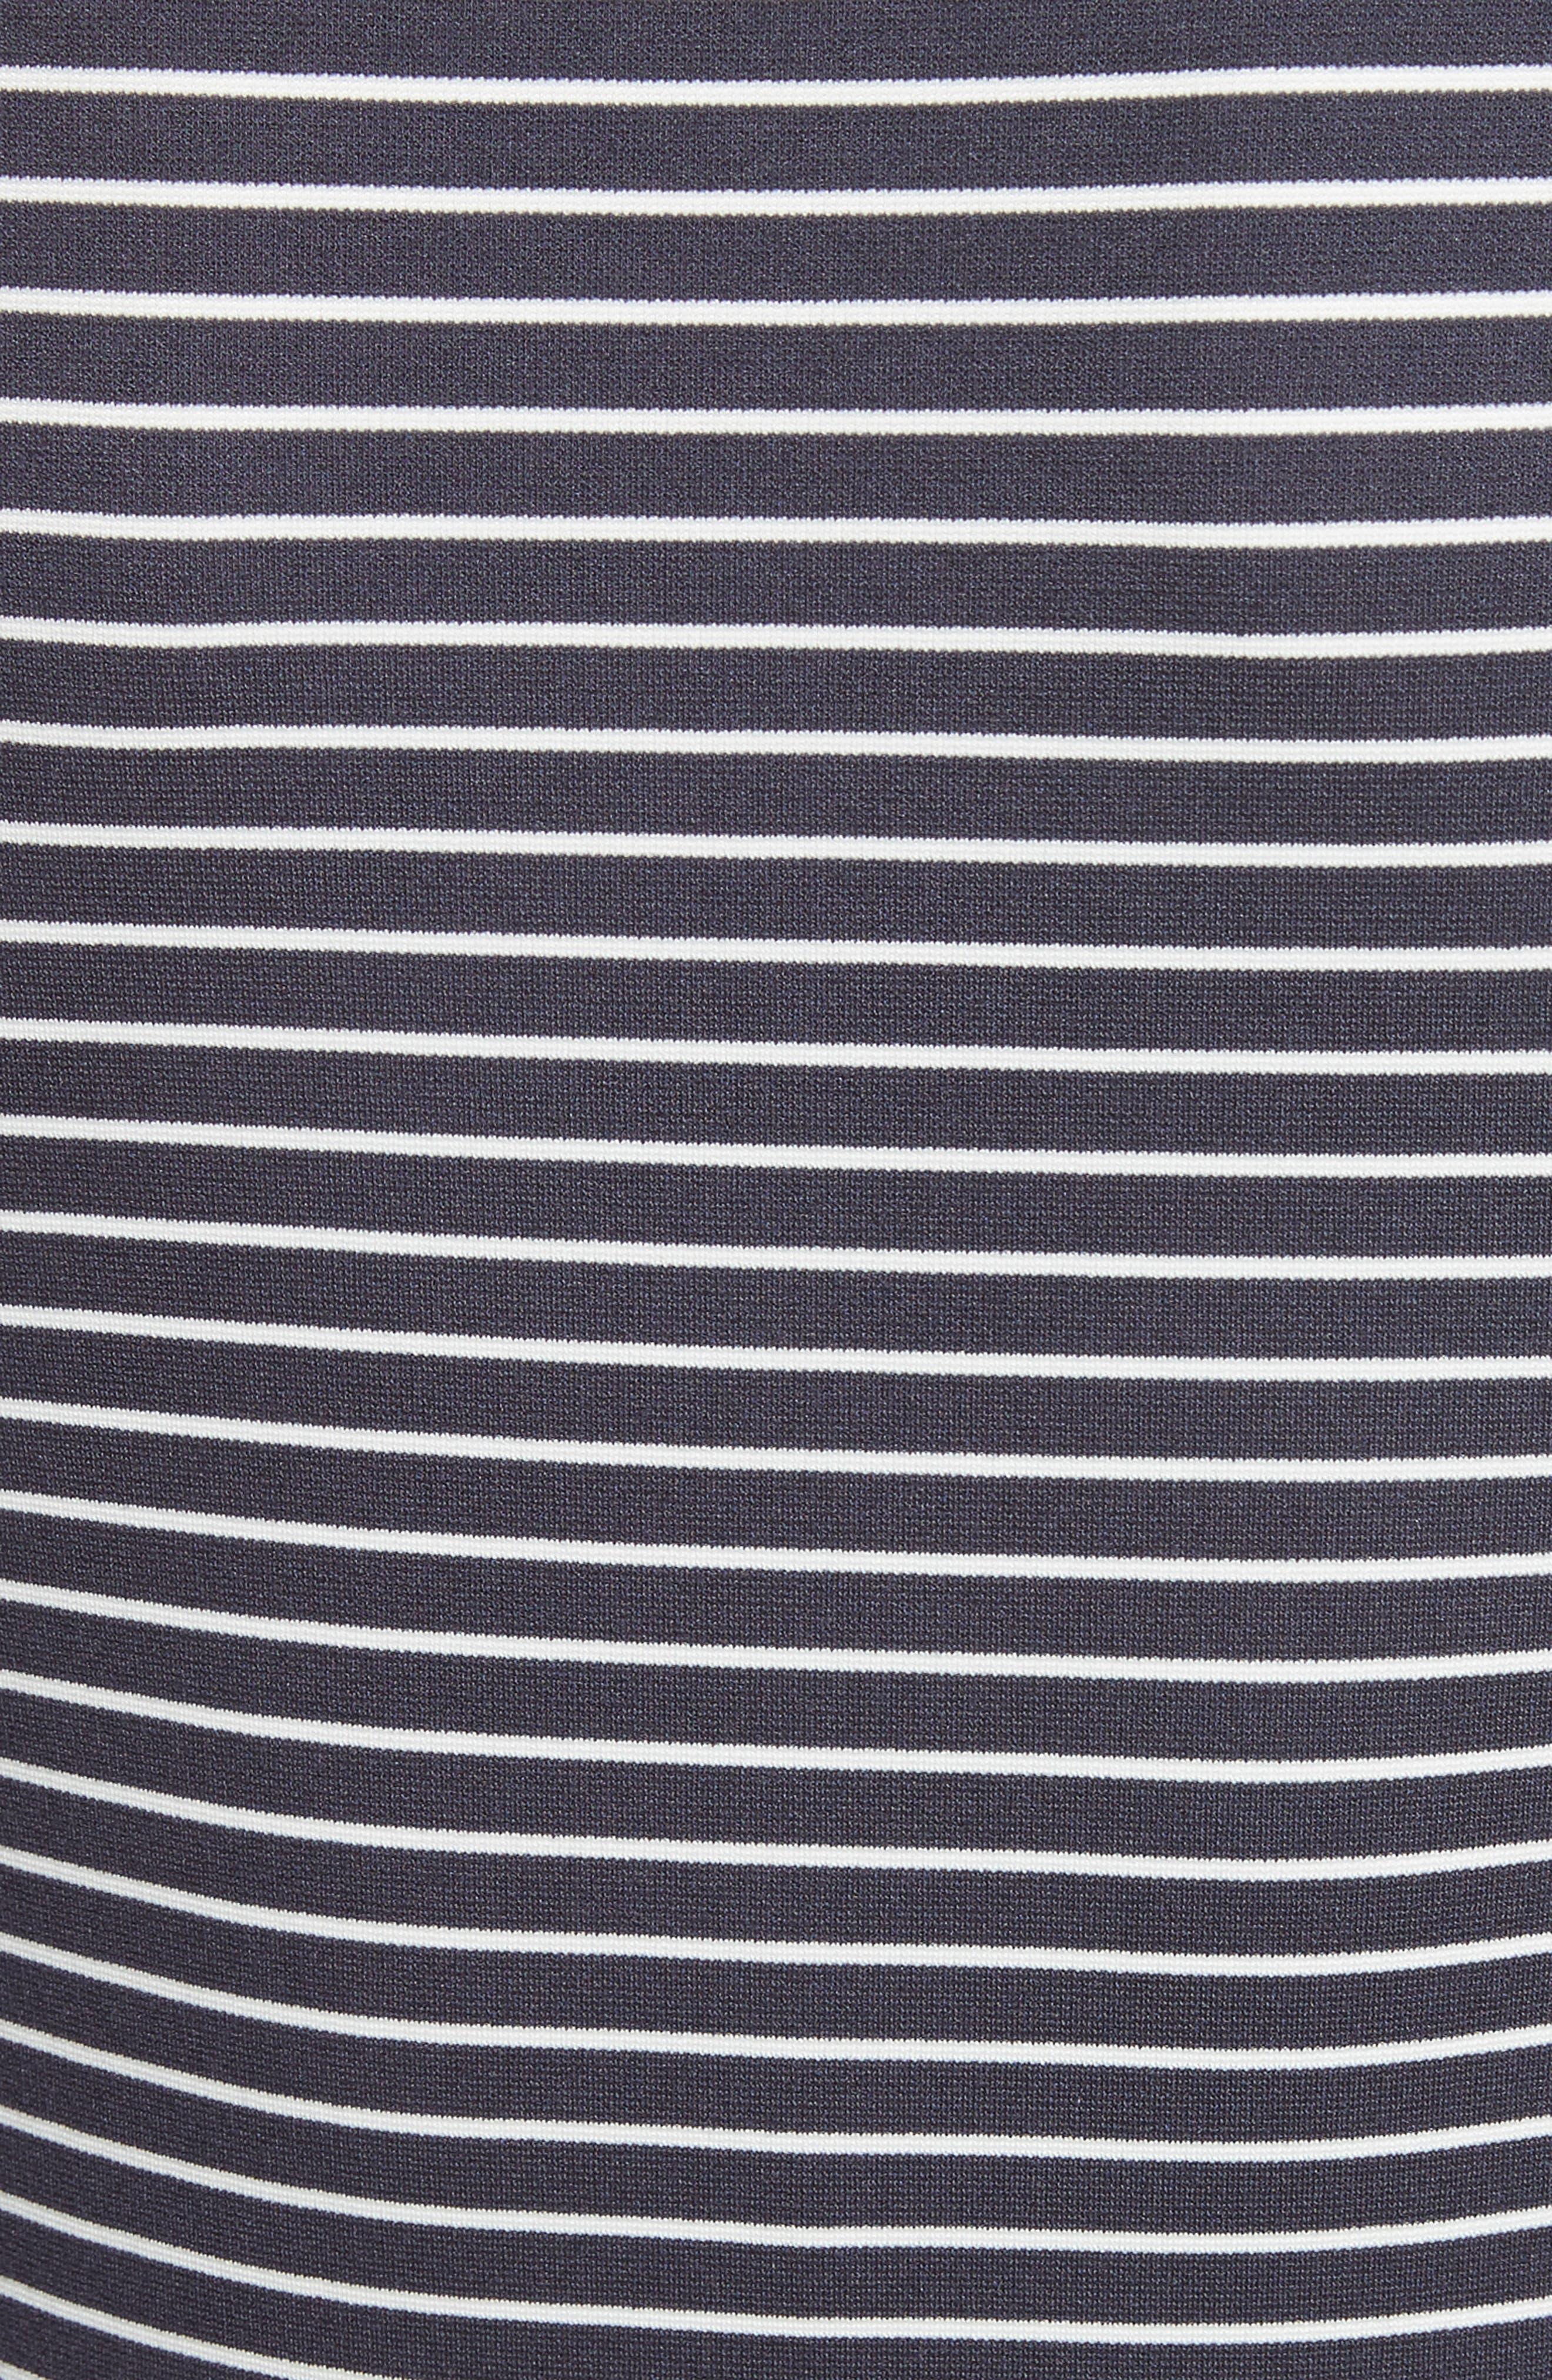 Stripe Bell Sleeve Top,                             Alternate thumbnail 6, color,                             Dark Navy Multi